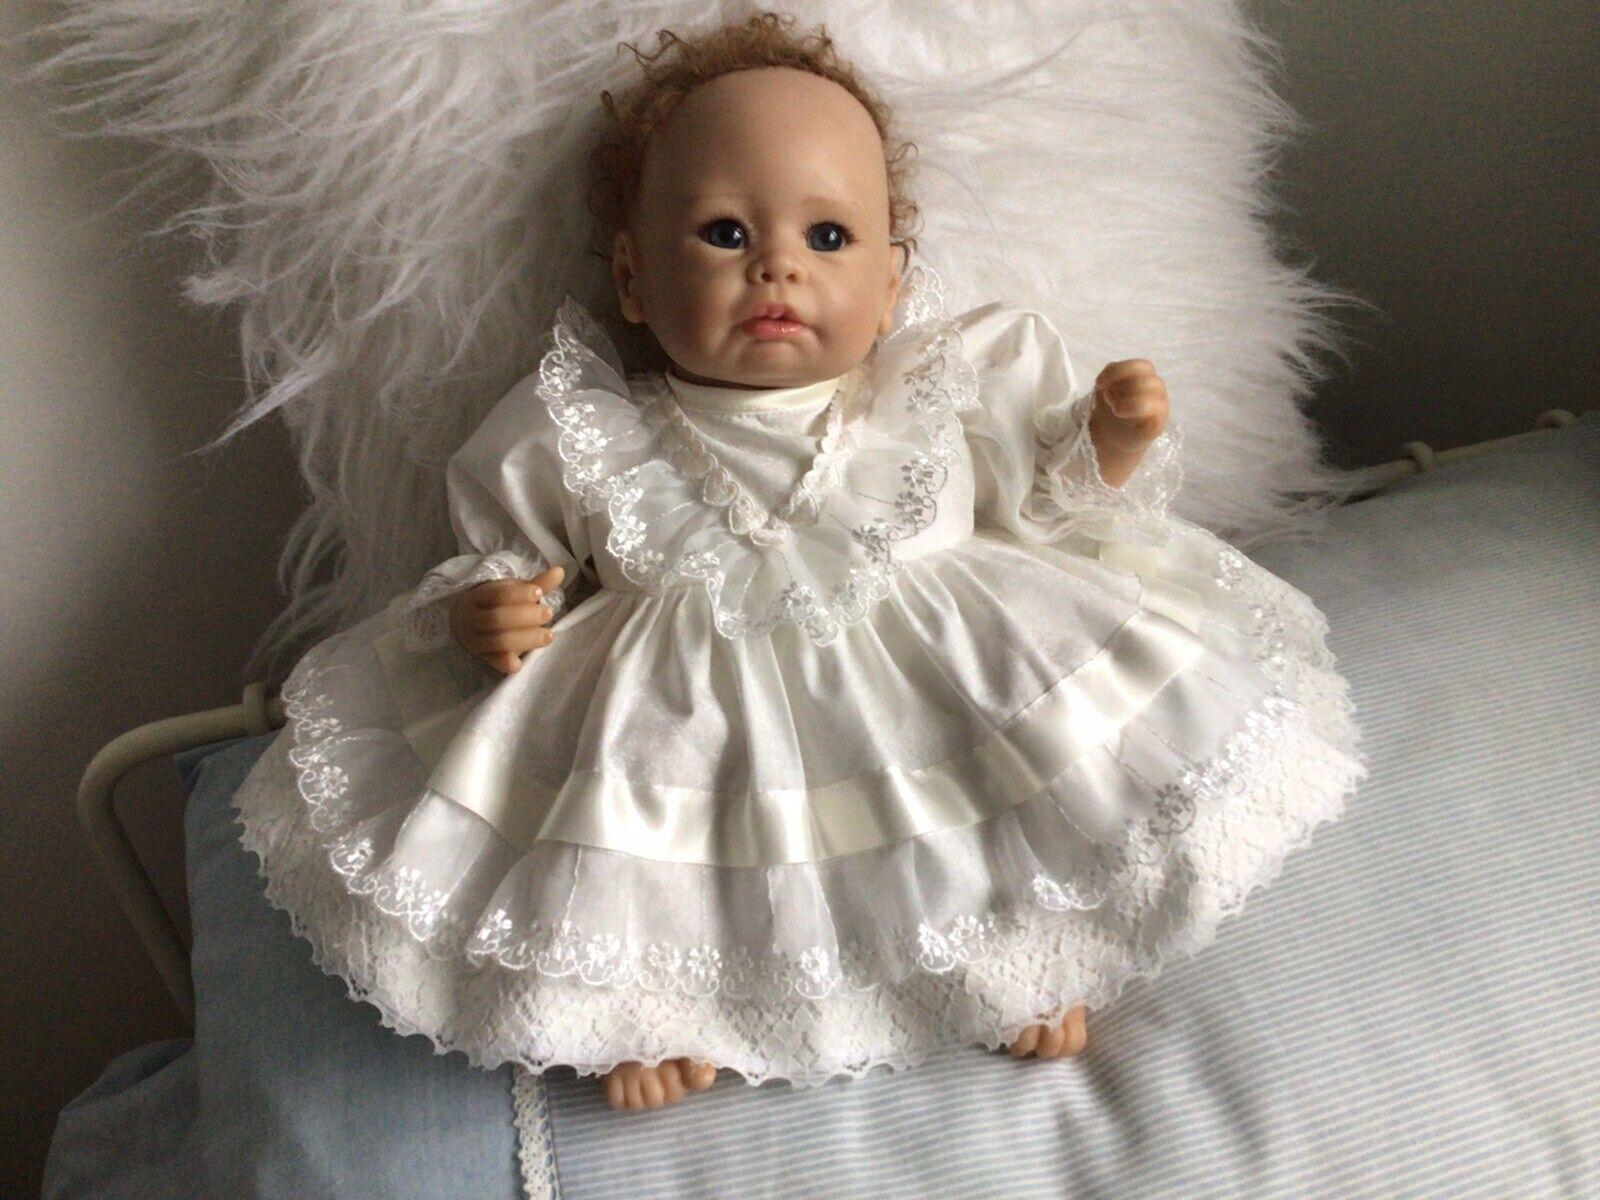 "CLOTHES New Born Baby /REBORN 16"" Two piece set.IvoryNew"